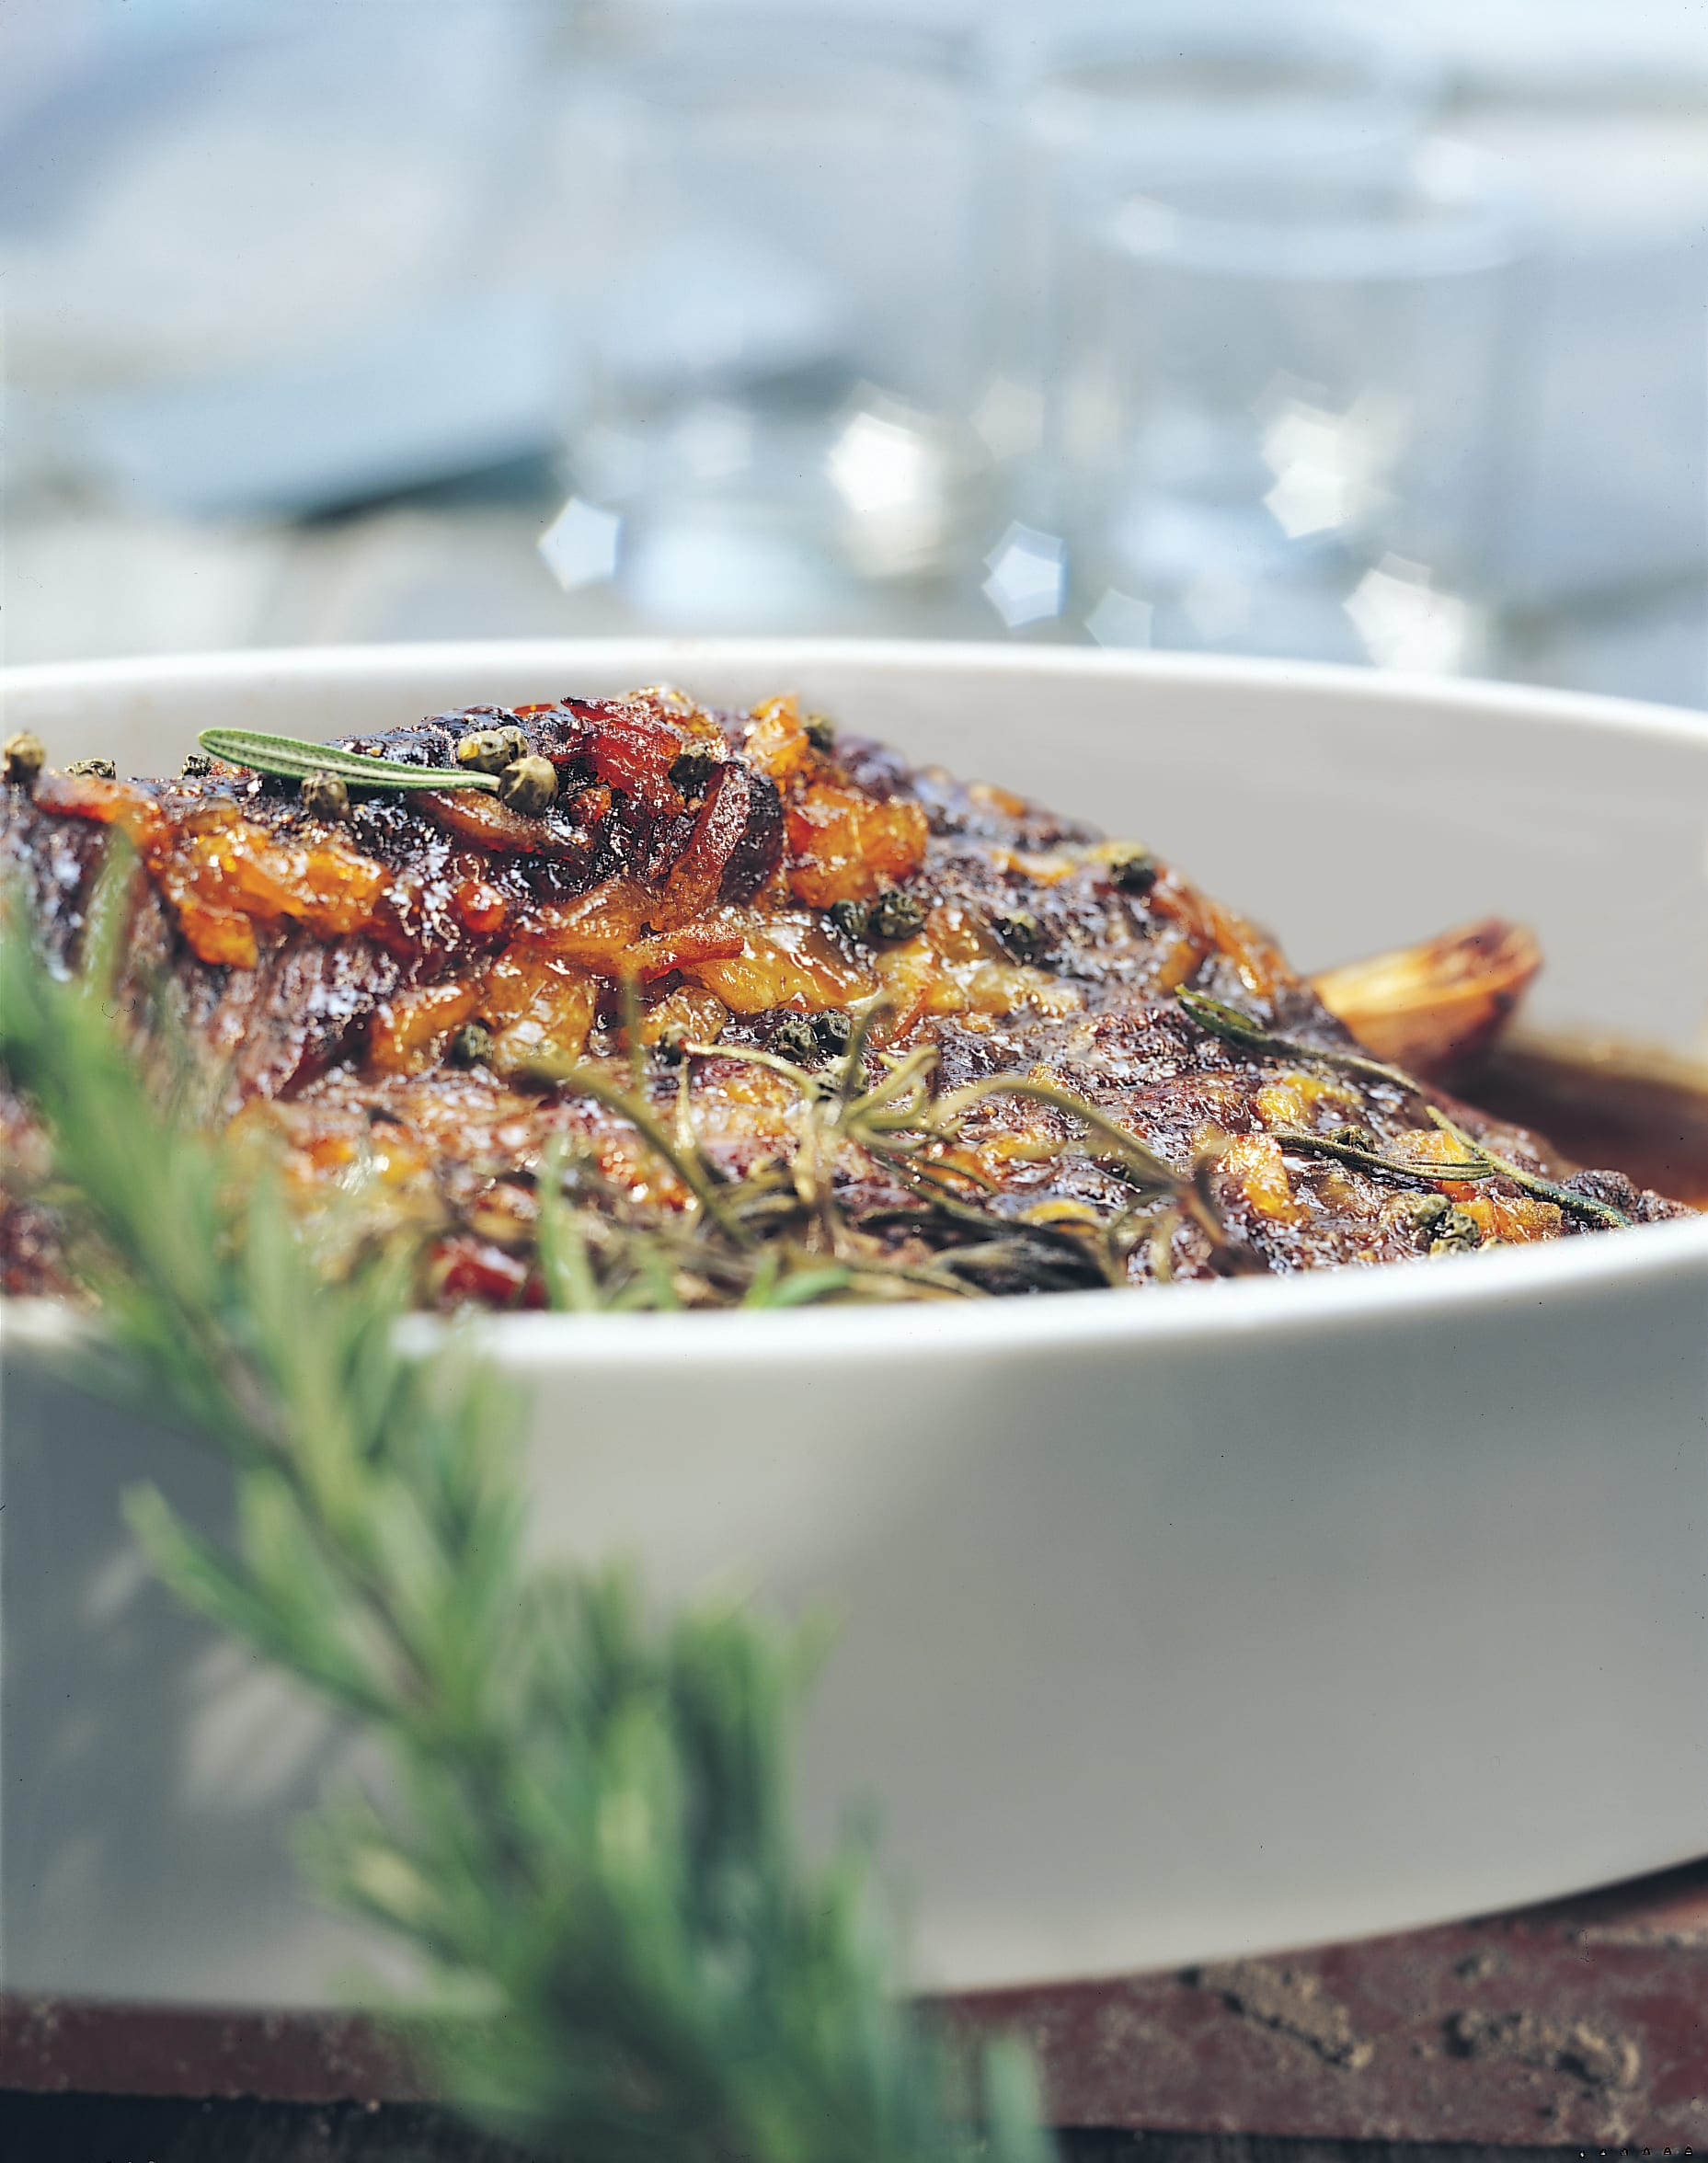 Rôti de boeuf lardé au four avec marinade à l'orange